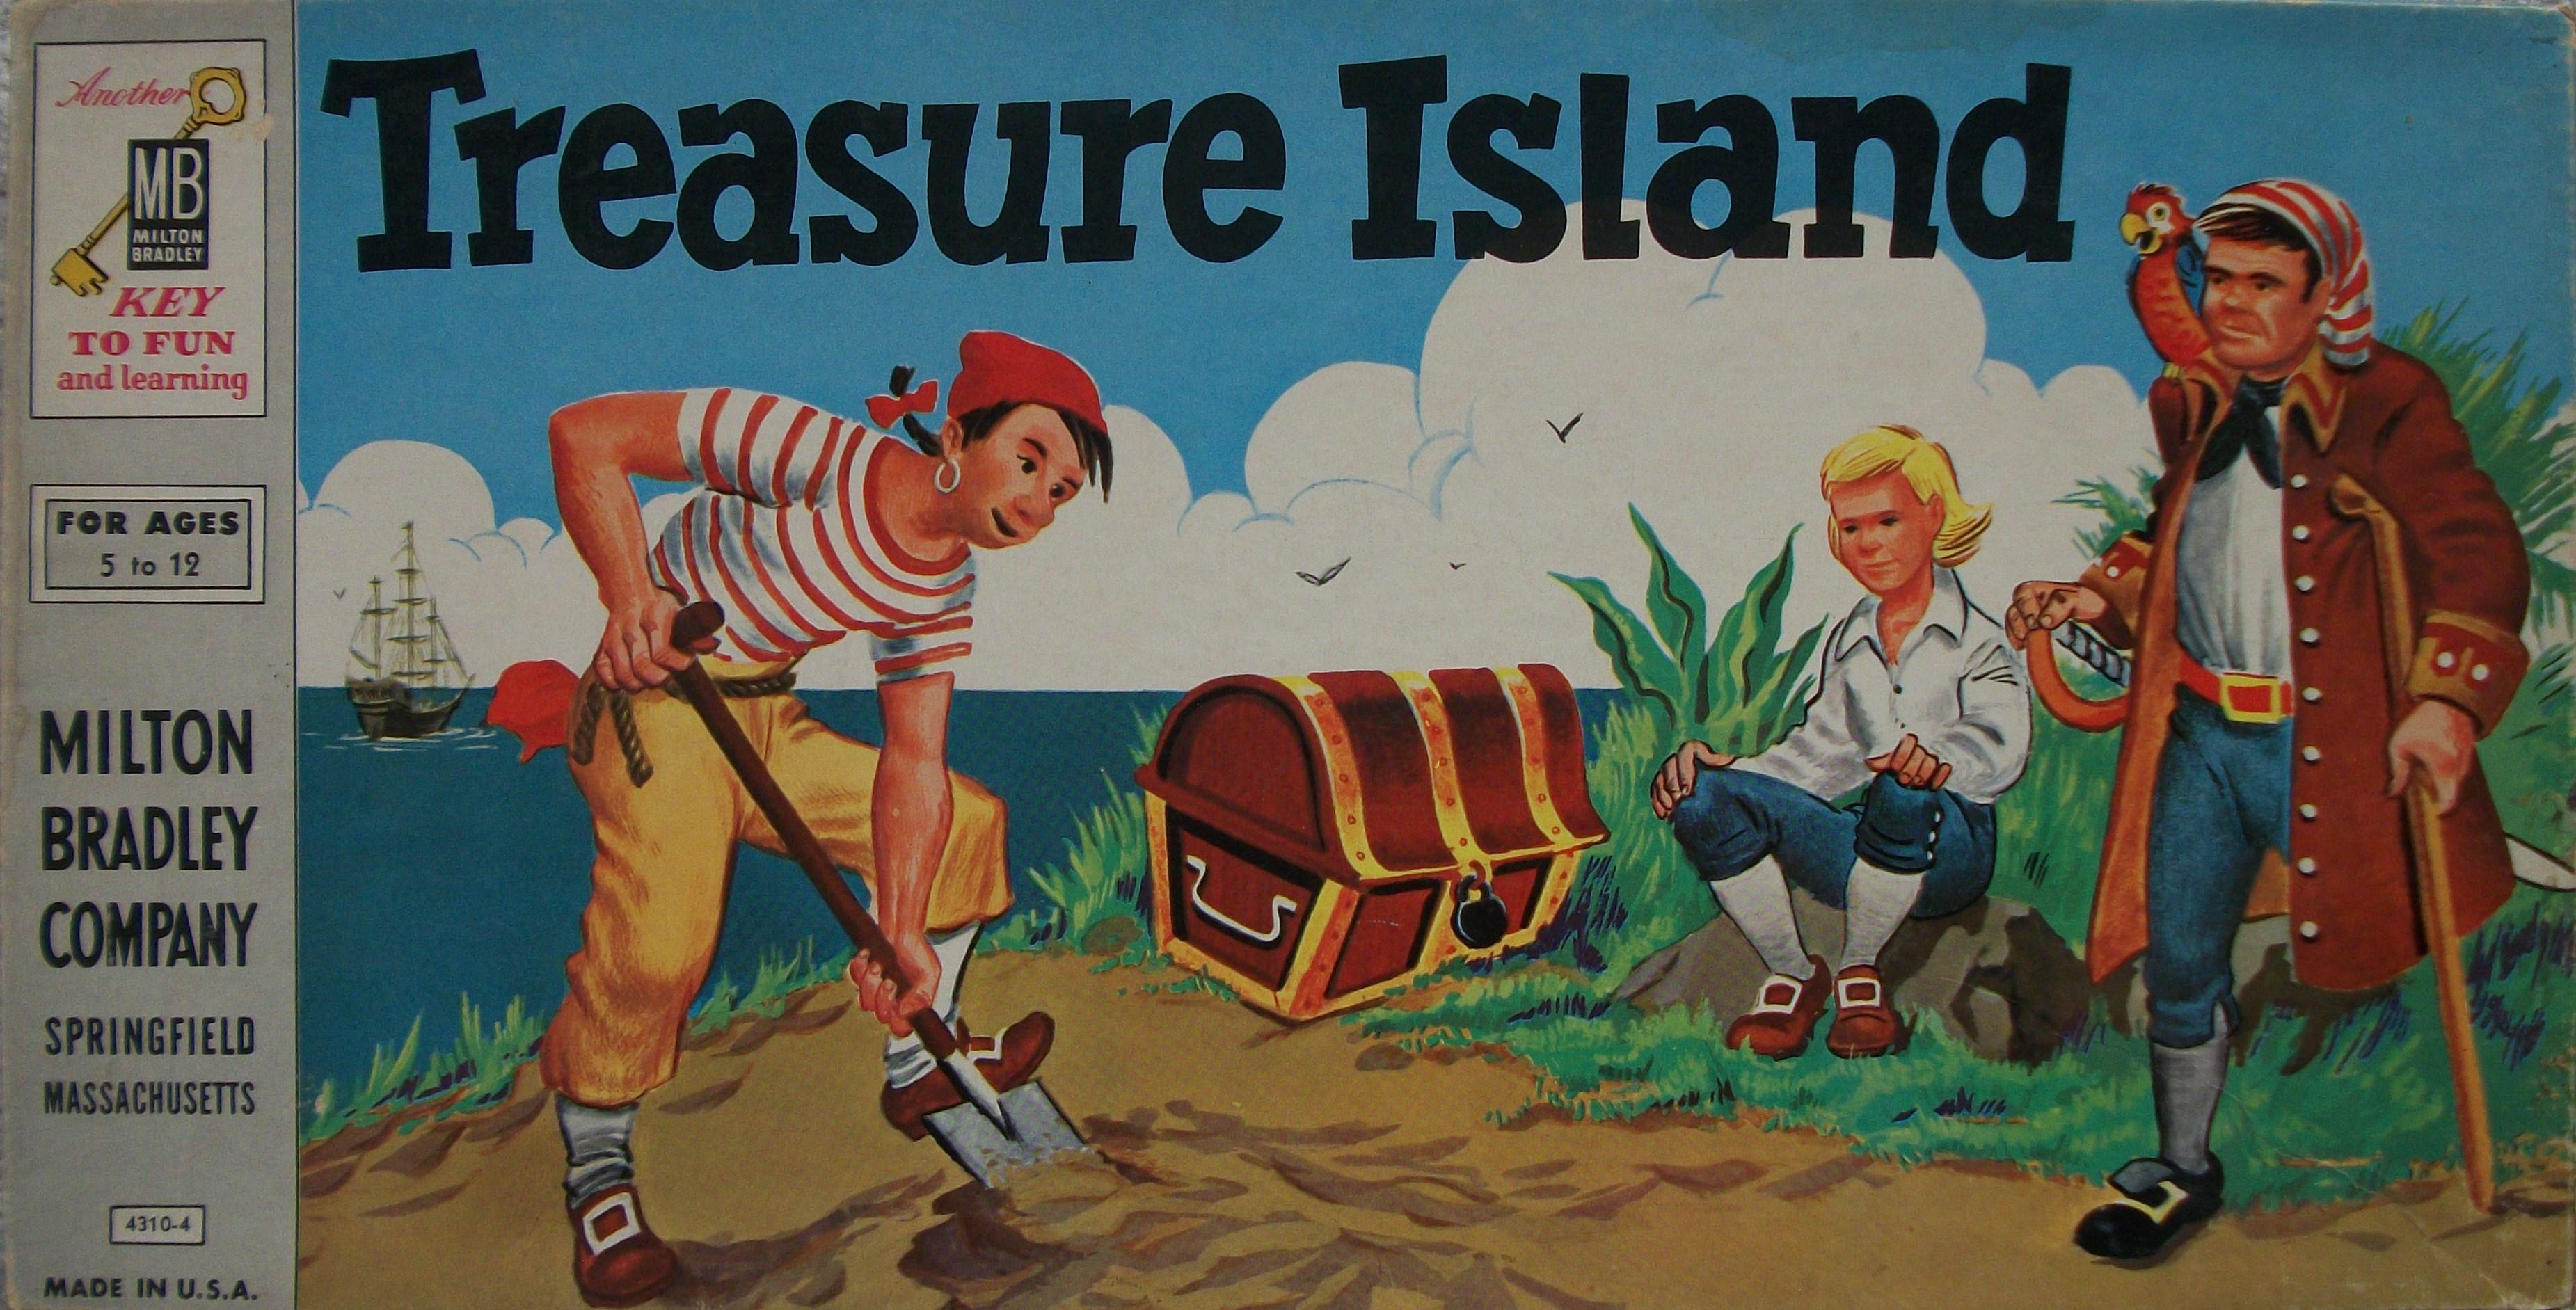 High Resolution Wallpaper | Treasure Island 3702x1883 px